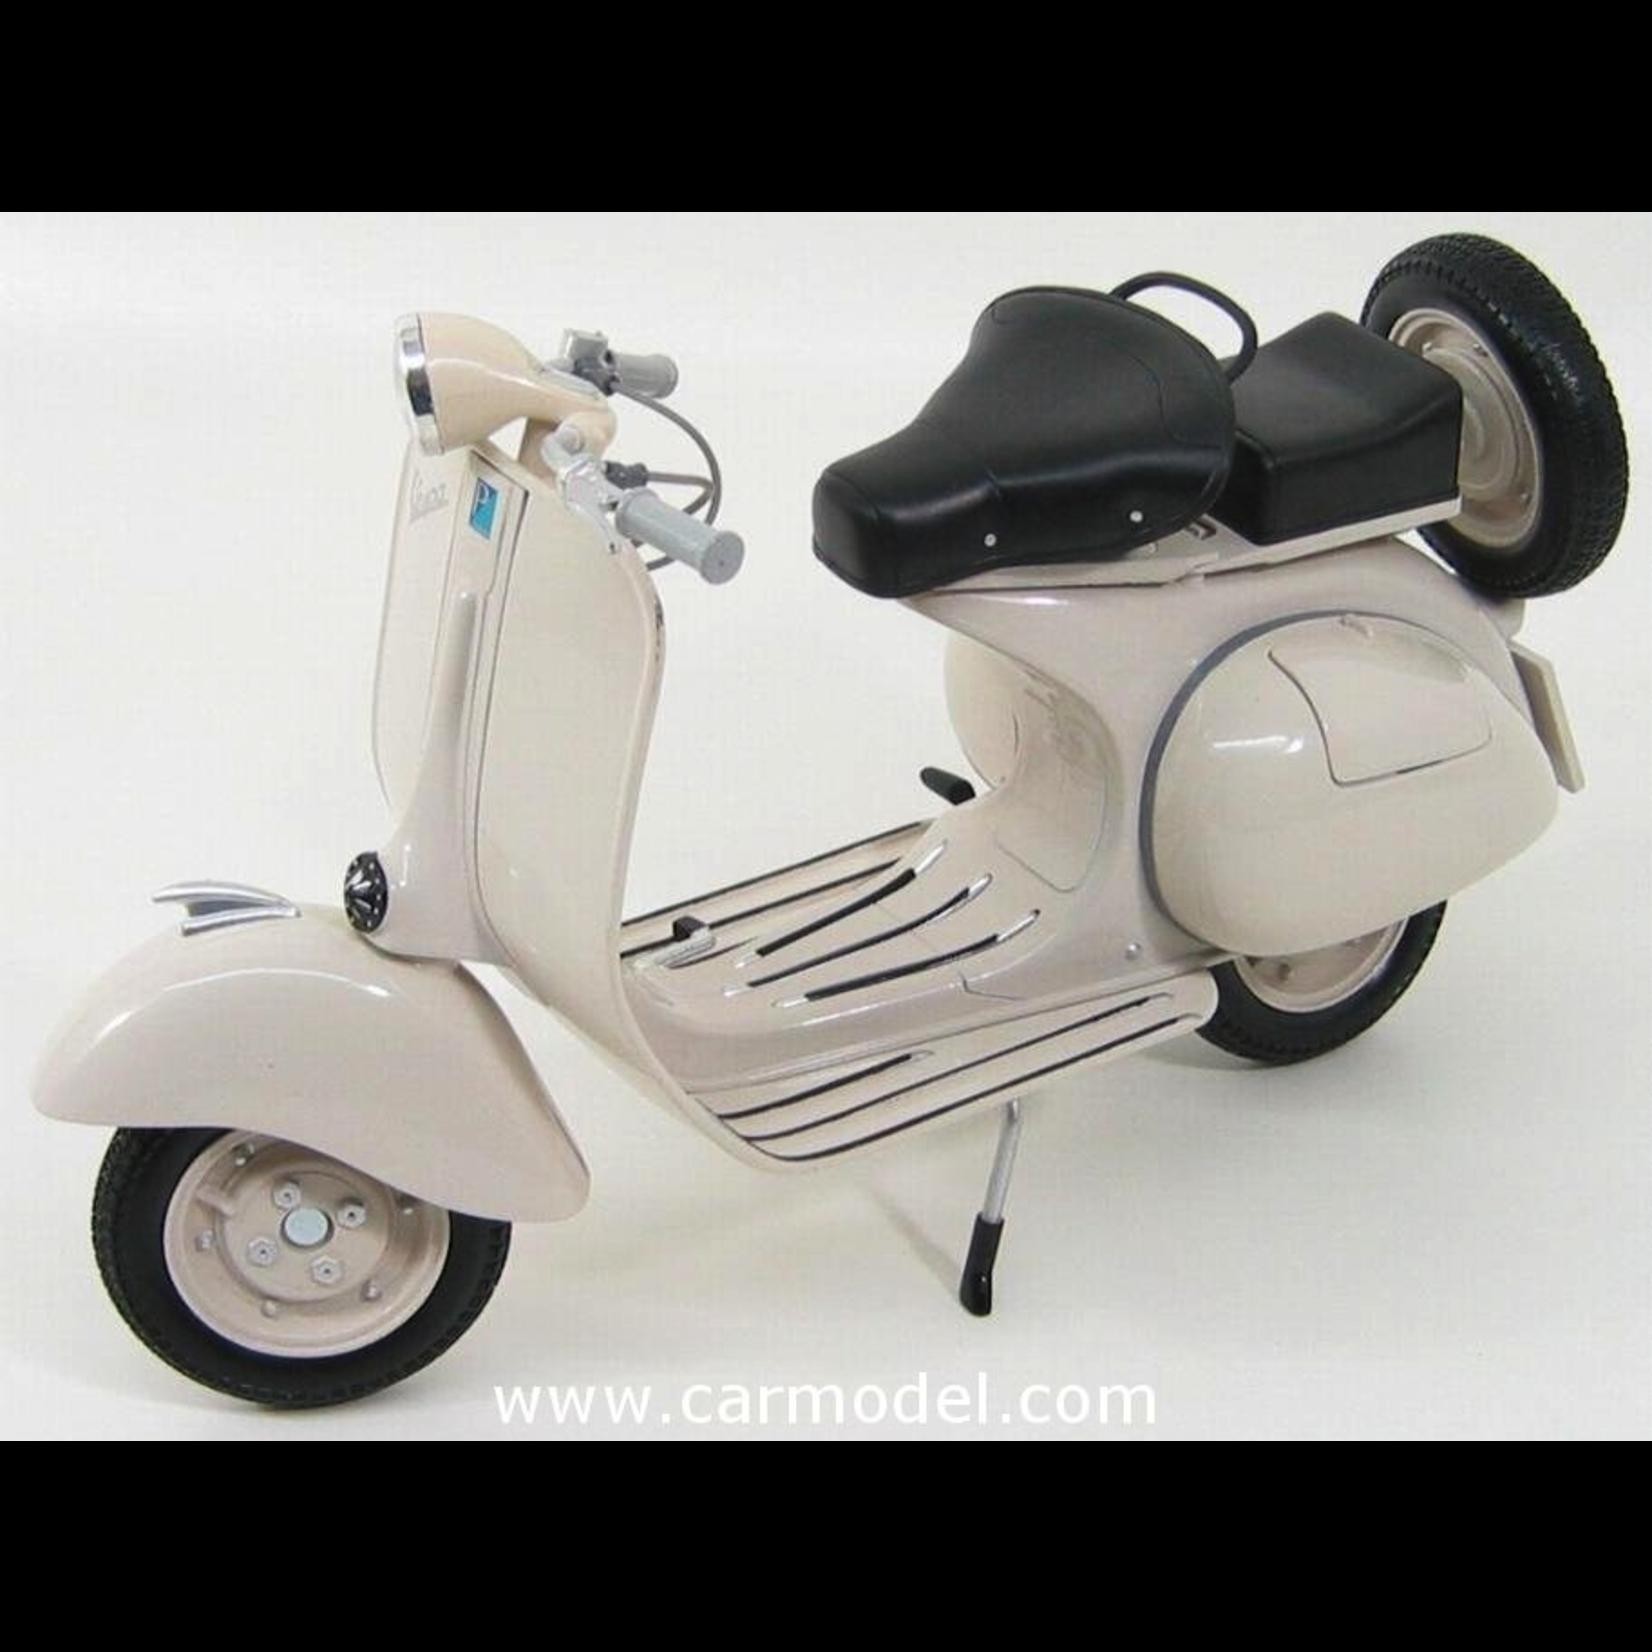 Lifestyle Toy, Vespa 150 1:6 Scale